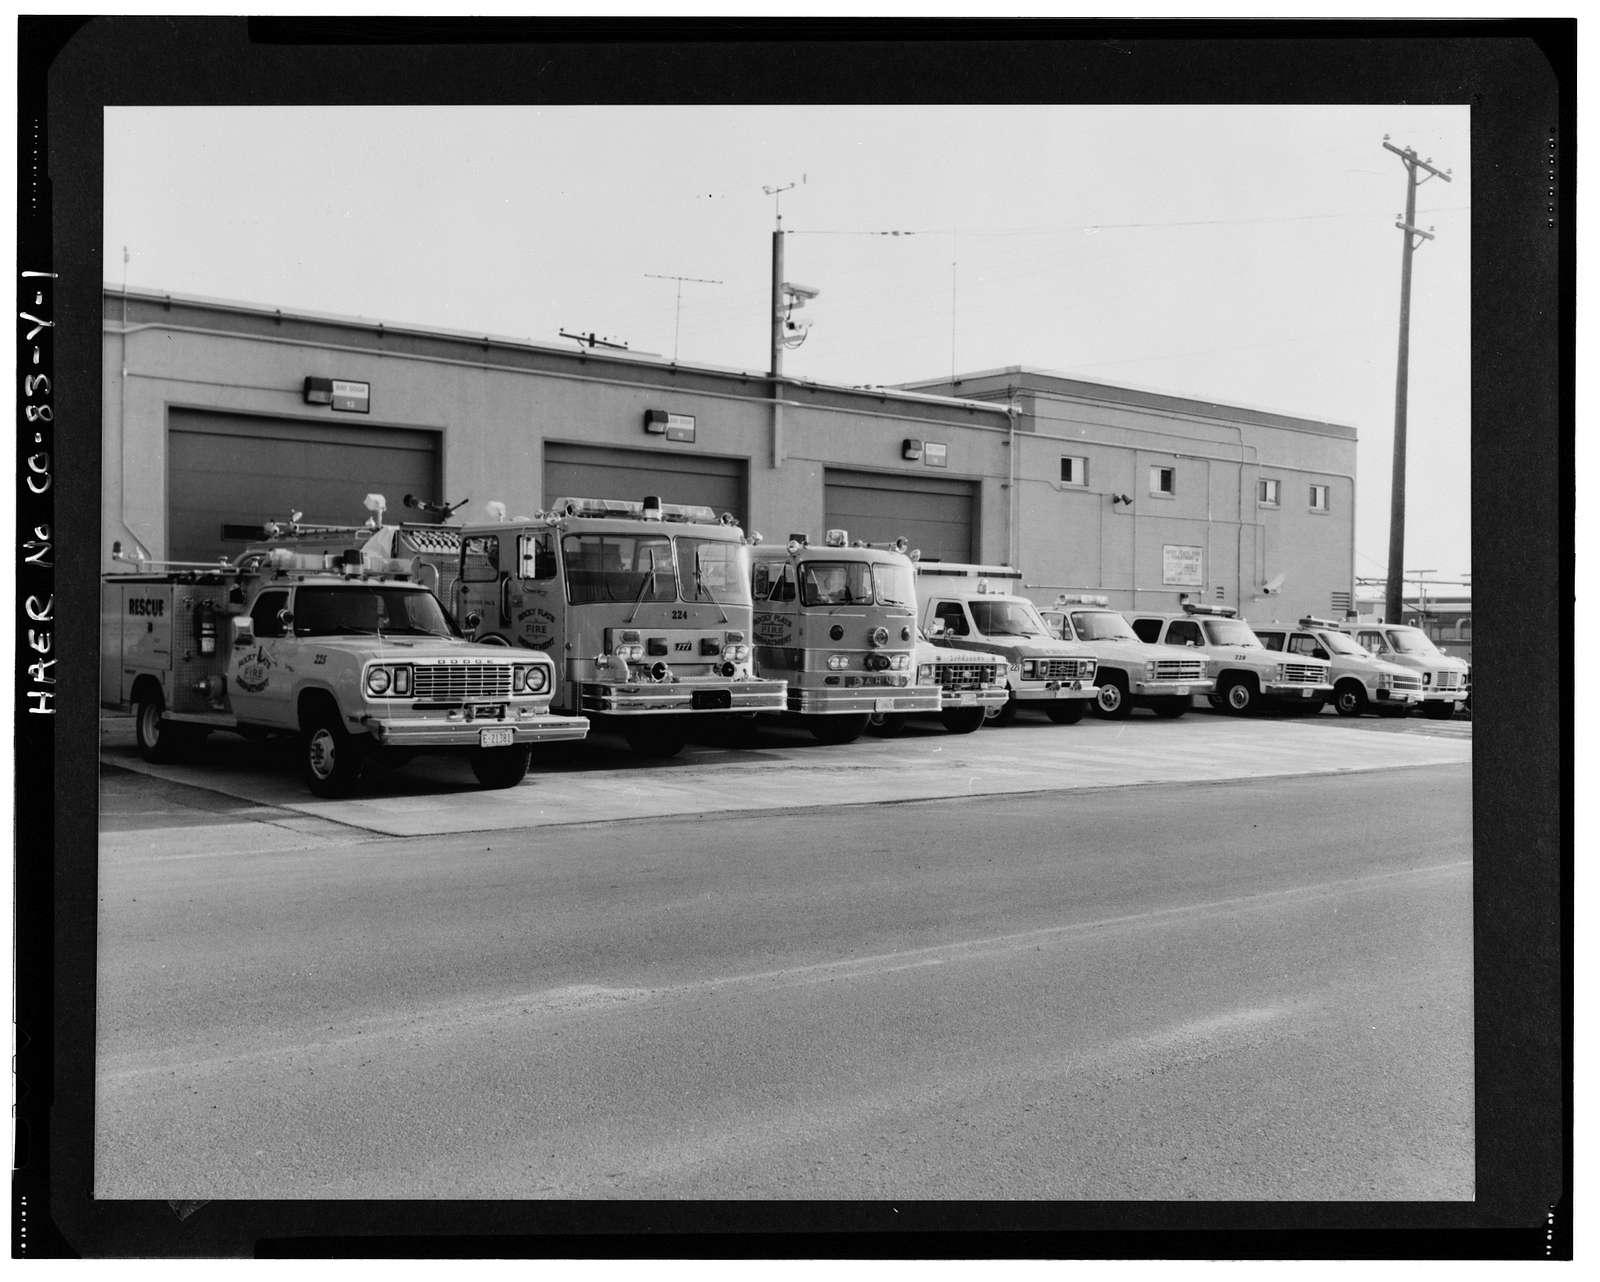 Rocky Flats Plant, Vehicle Maintenance Garage & Fire Station, Golden, Jefferson County, CO